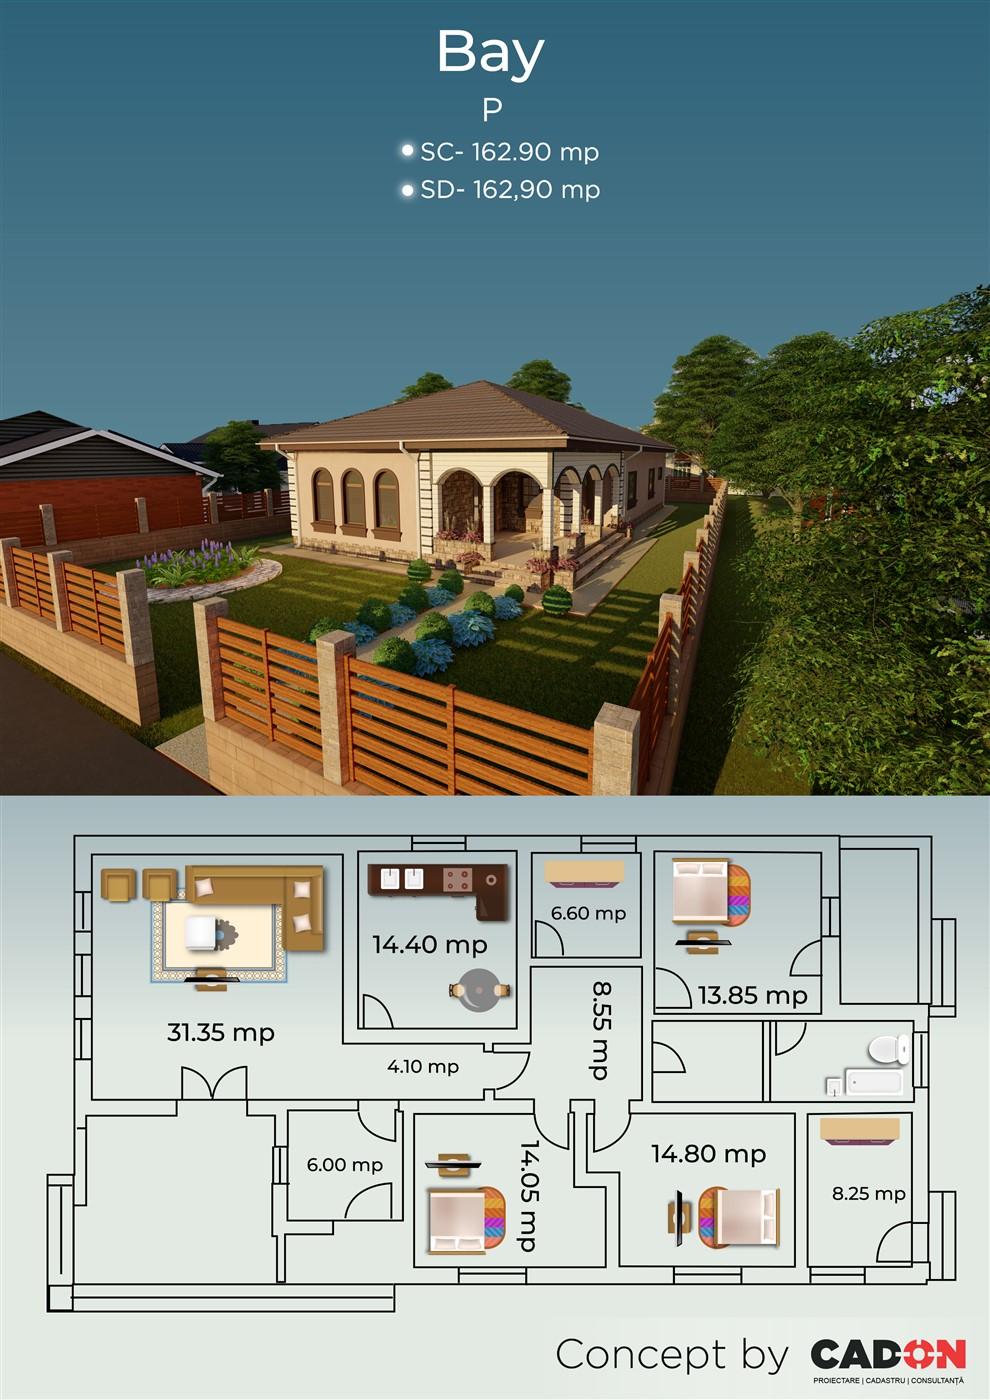 Model prezentare Bay site